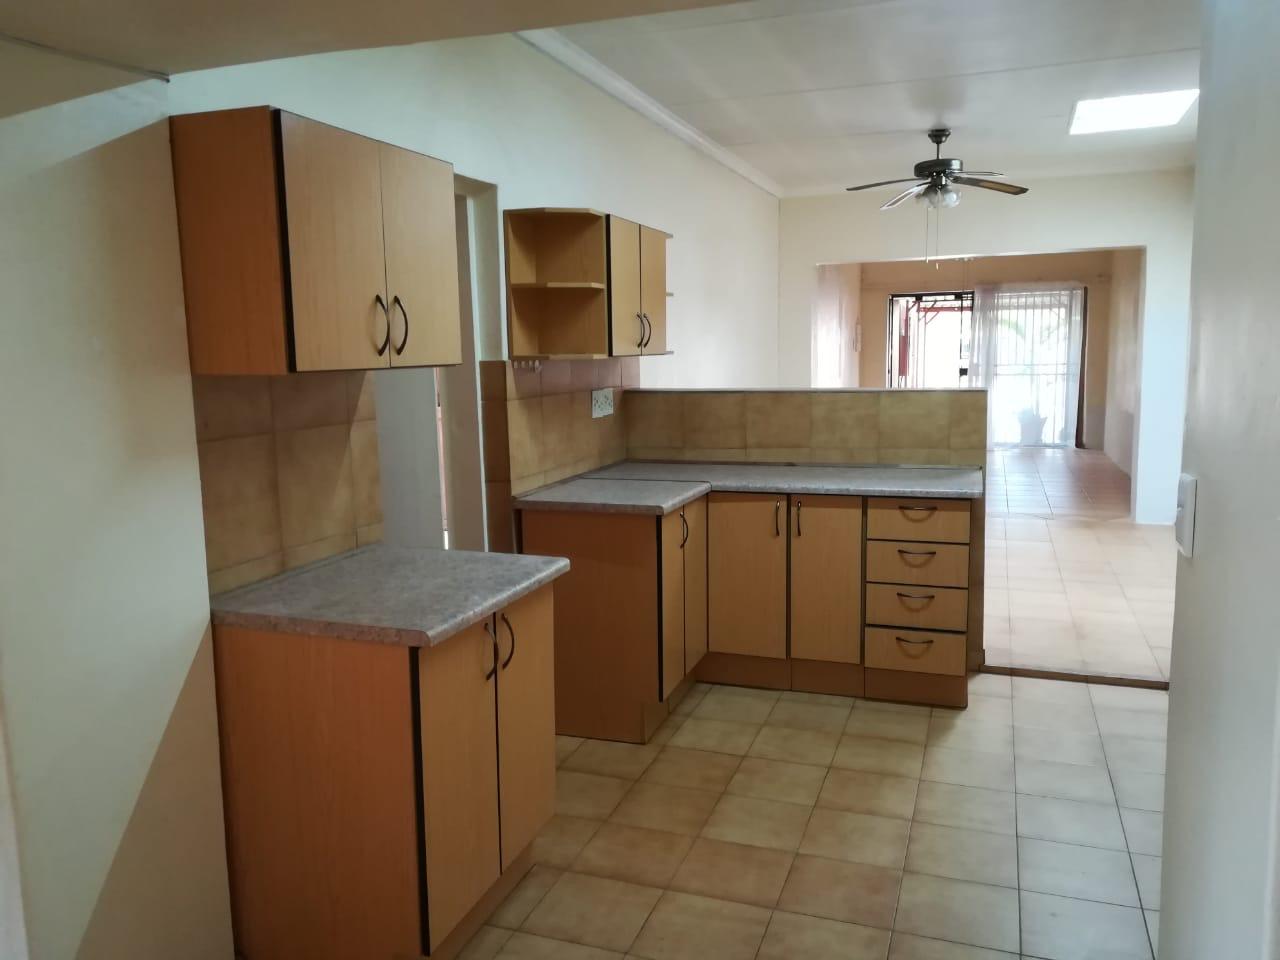 Cottage/Townhouse/Garden Flat TO LET in Villieria Pretoria